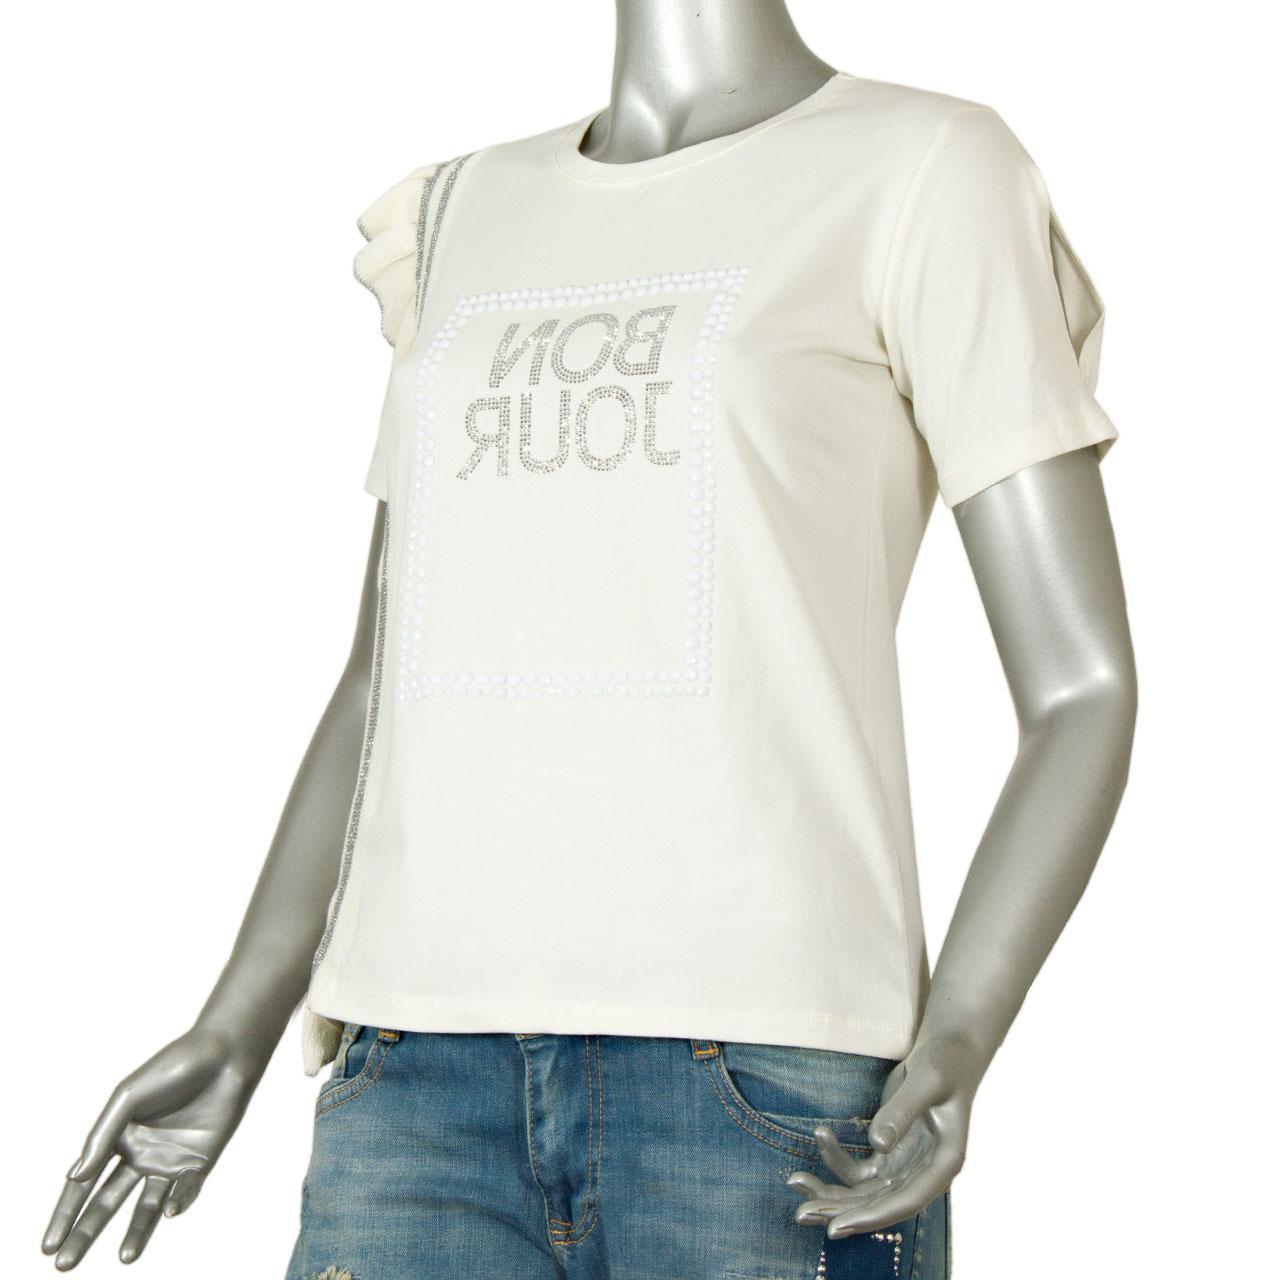 8bbc84f1fcf69 Женская футболка RAW, цена 615 грн., купить в Кременчуге — Prom.ua ...